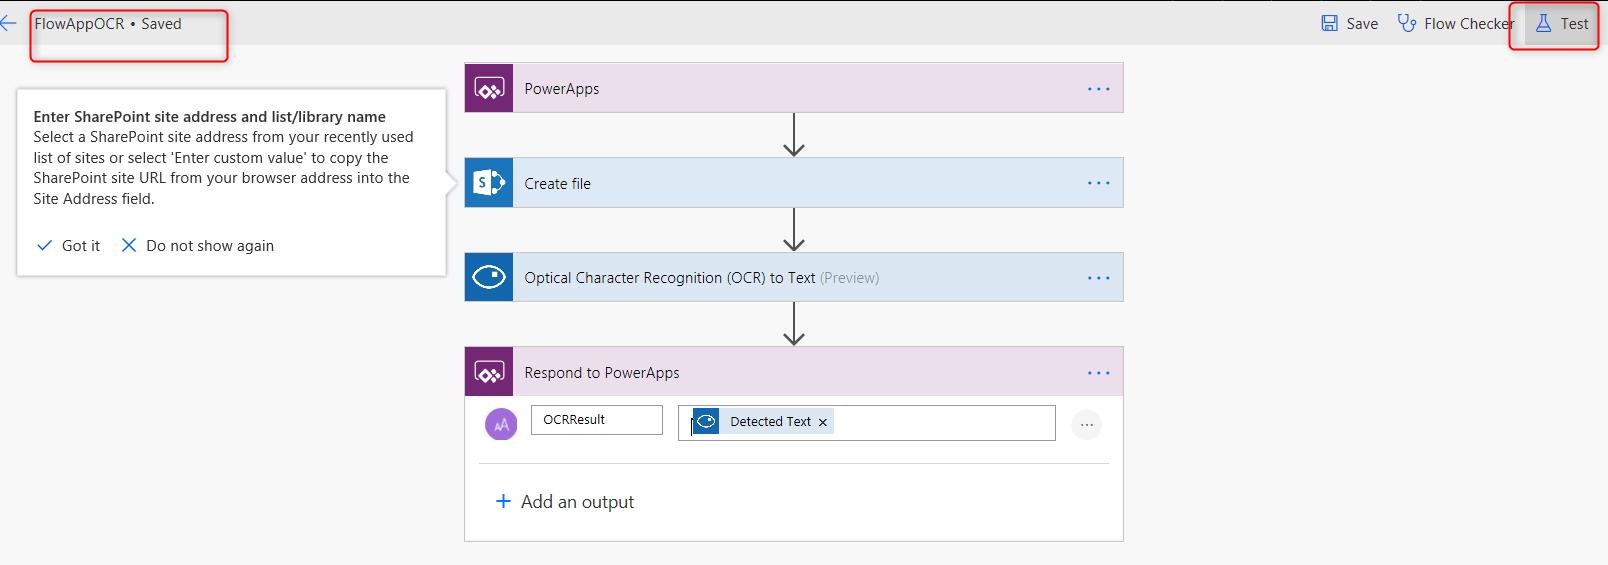 Image Processing- Invoice recording using Power App